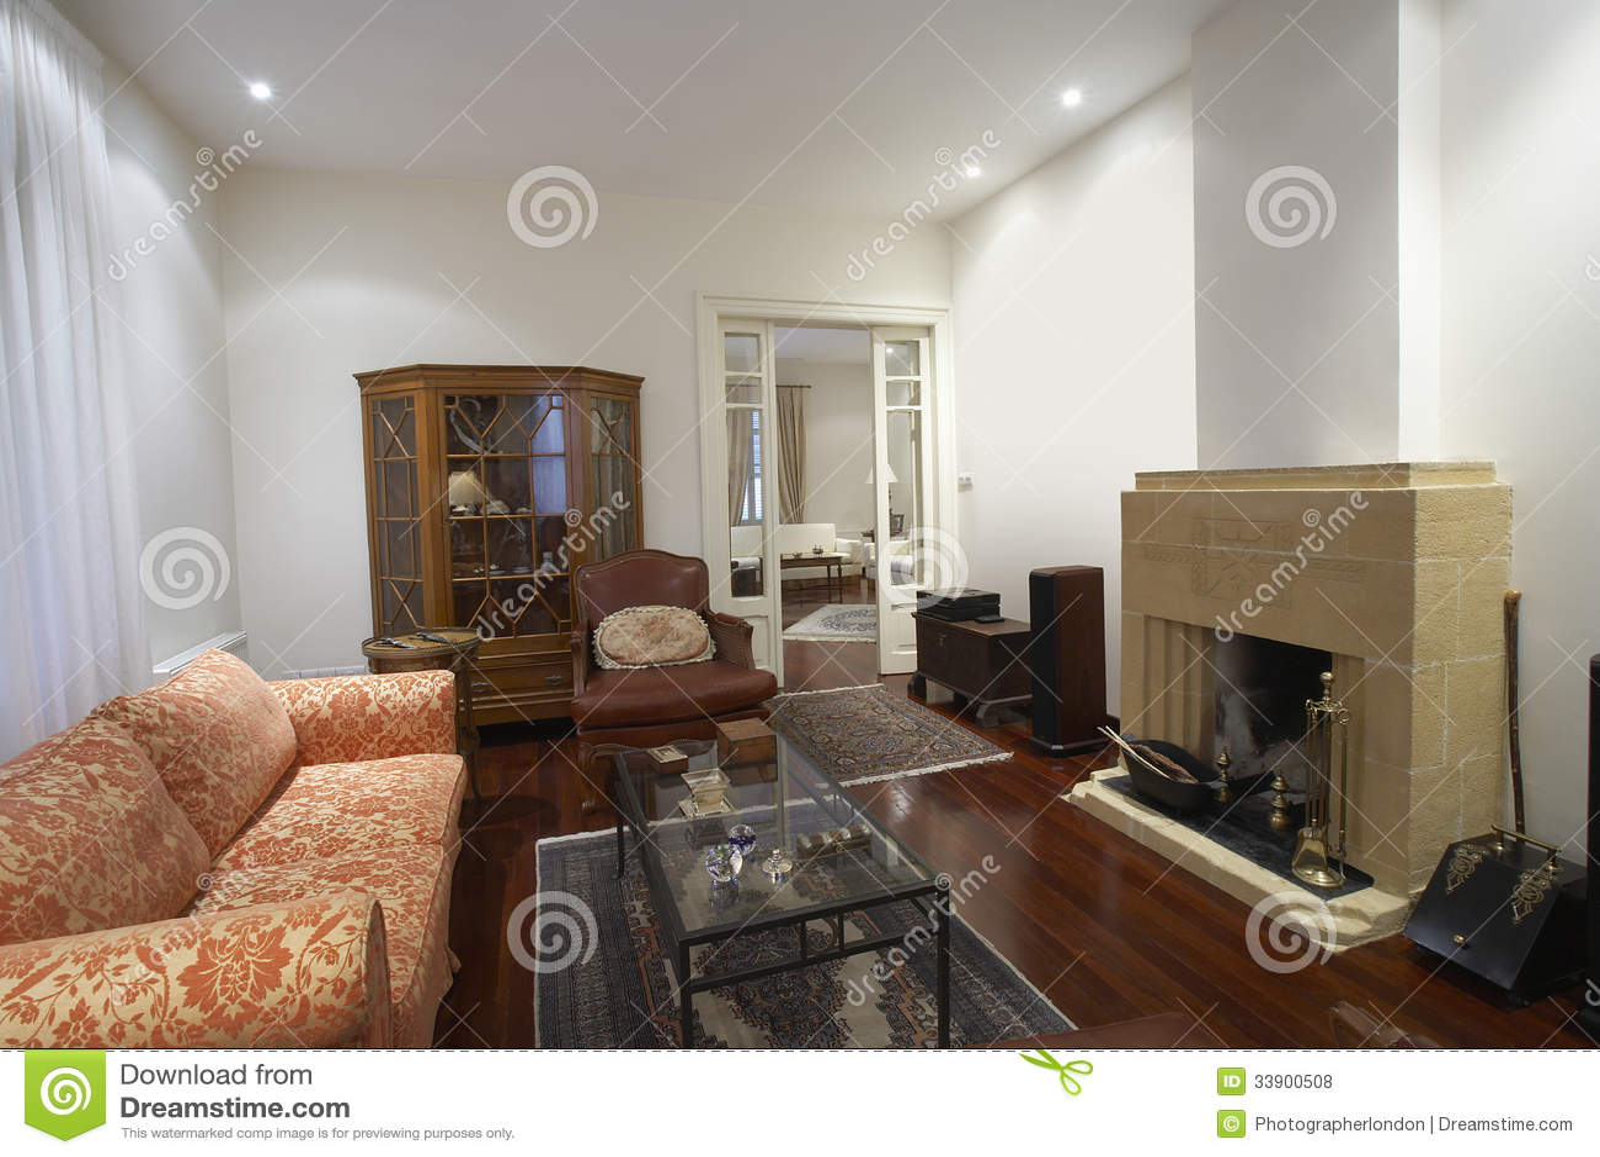 Muebles la chimenea usurbil great beautiful interesting elegant download sitio de la navidad - Muebles la chimenea catalogo ...